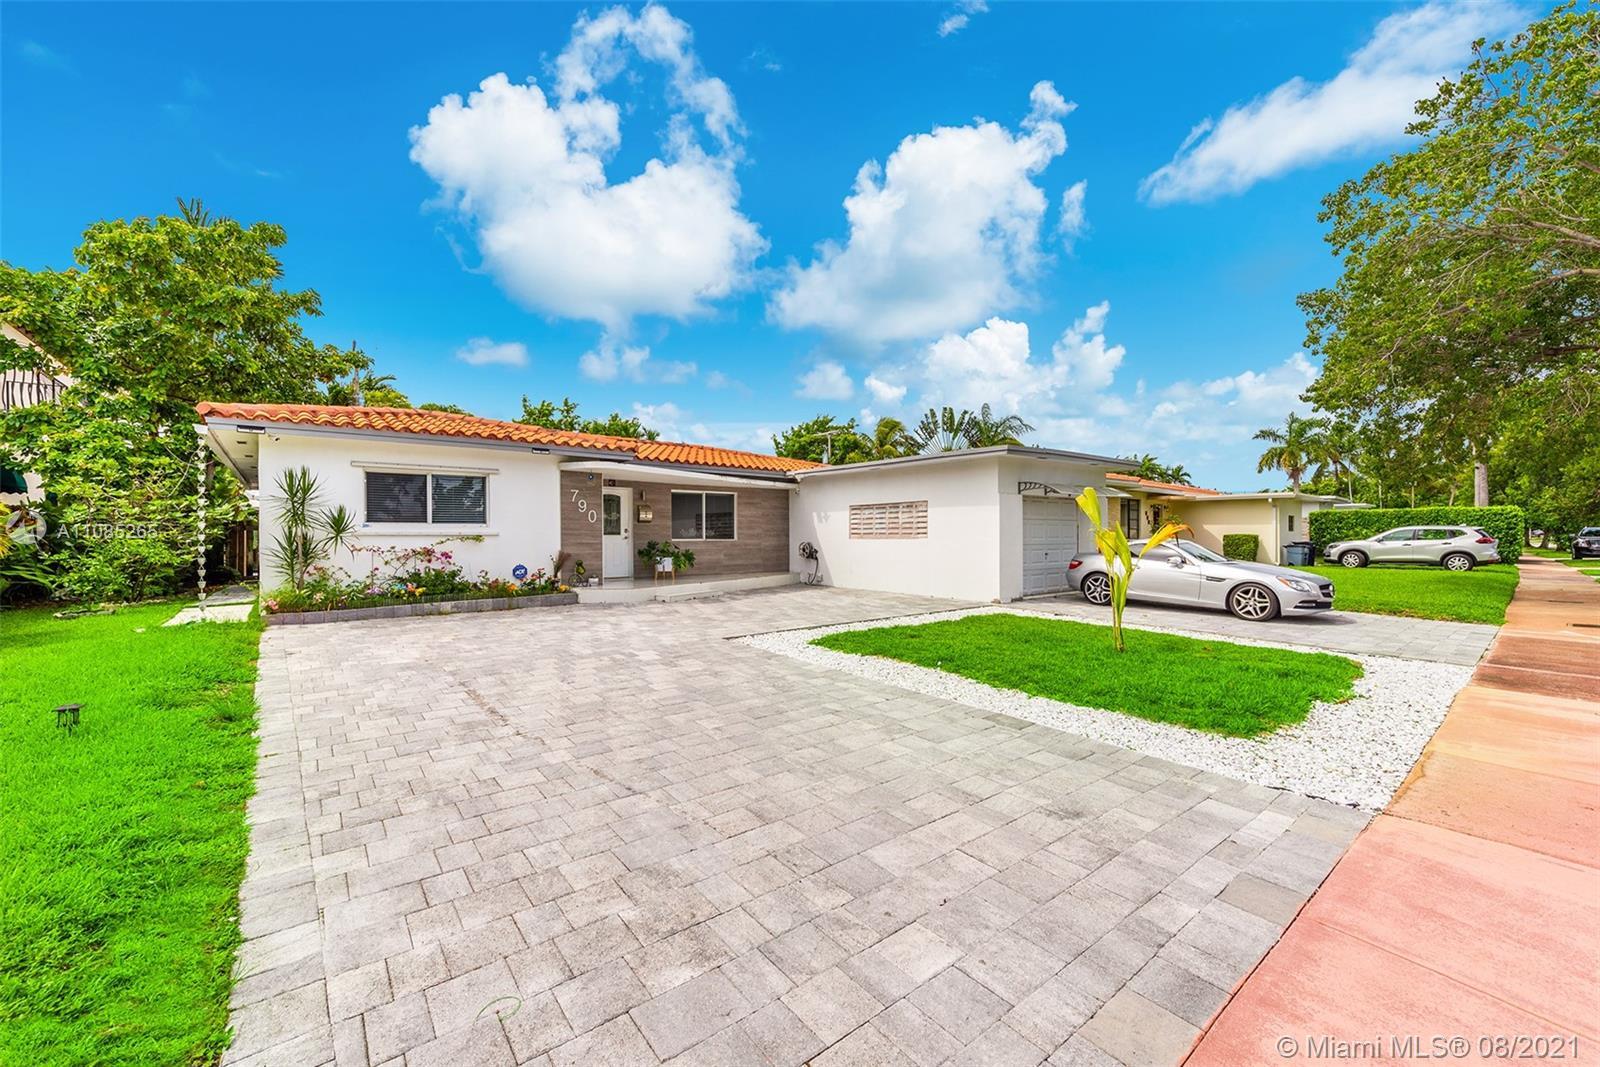 Isle of Normandy - 790 N Shore Dr, Miami Beach, FL 33141